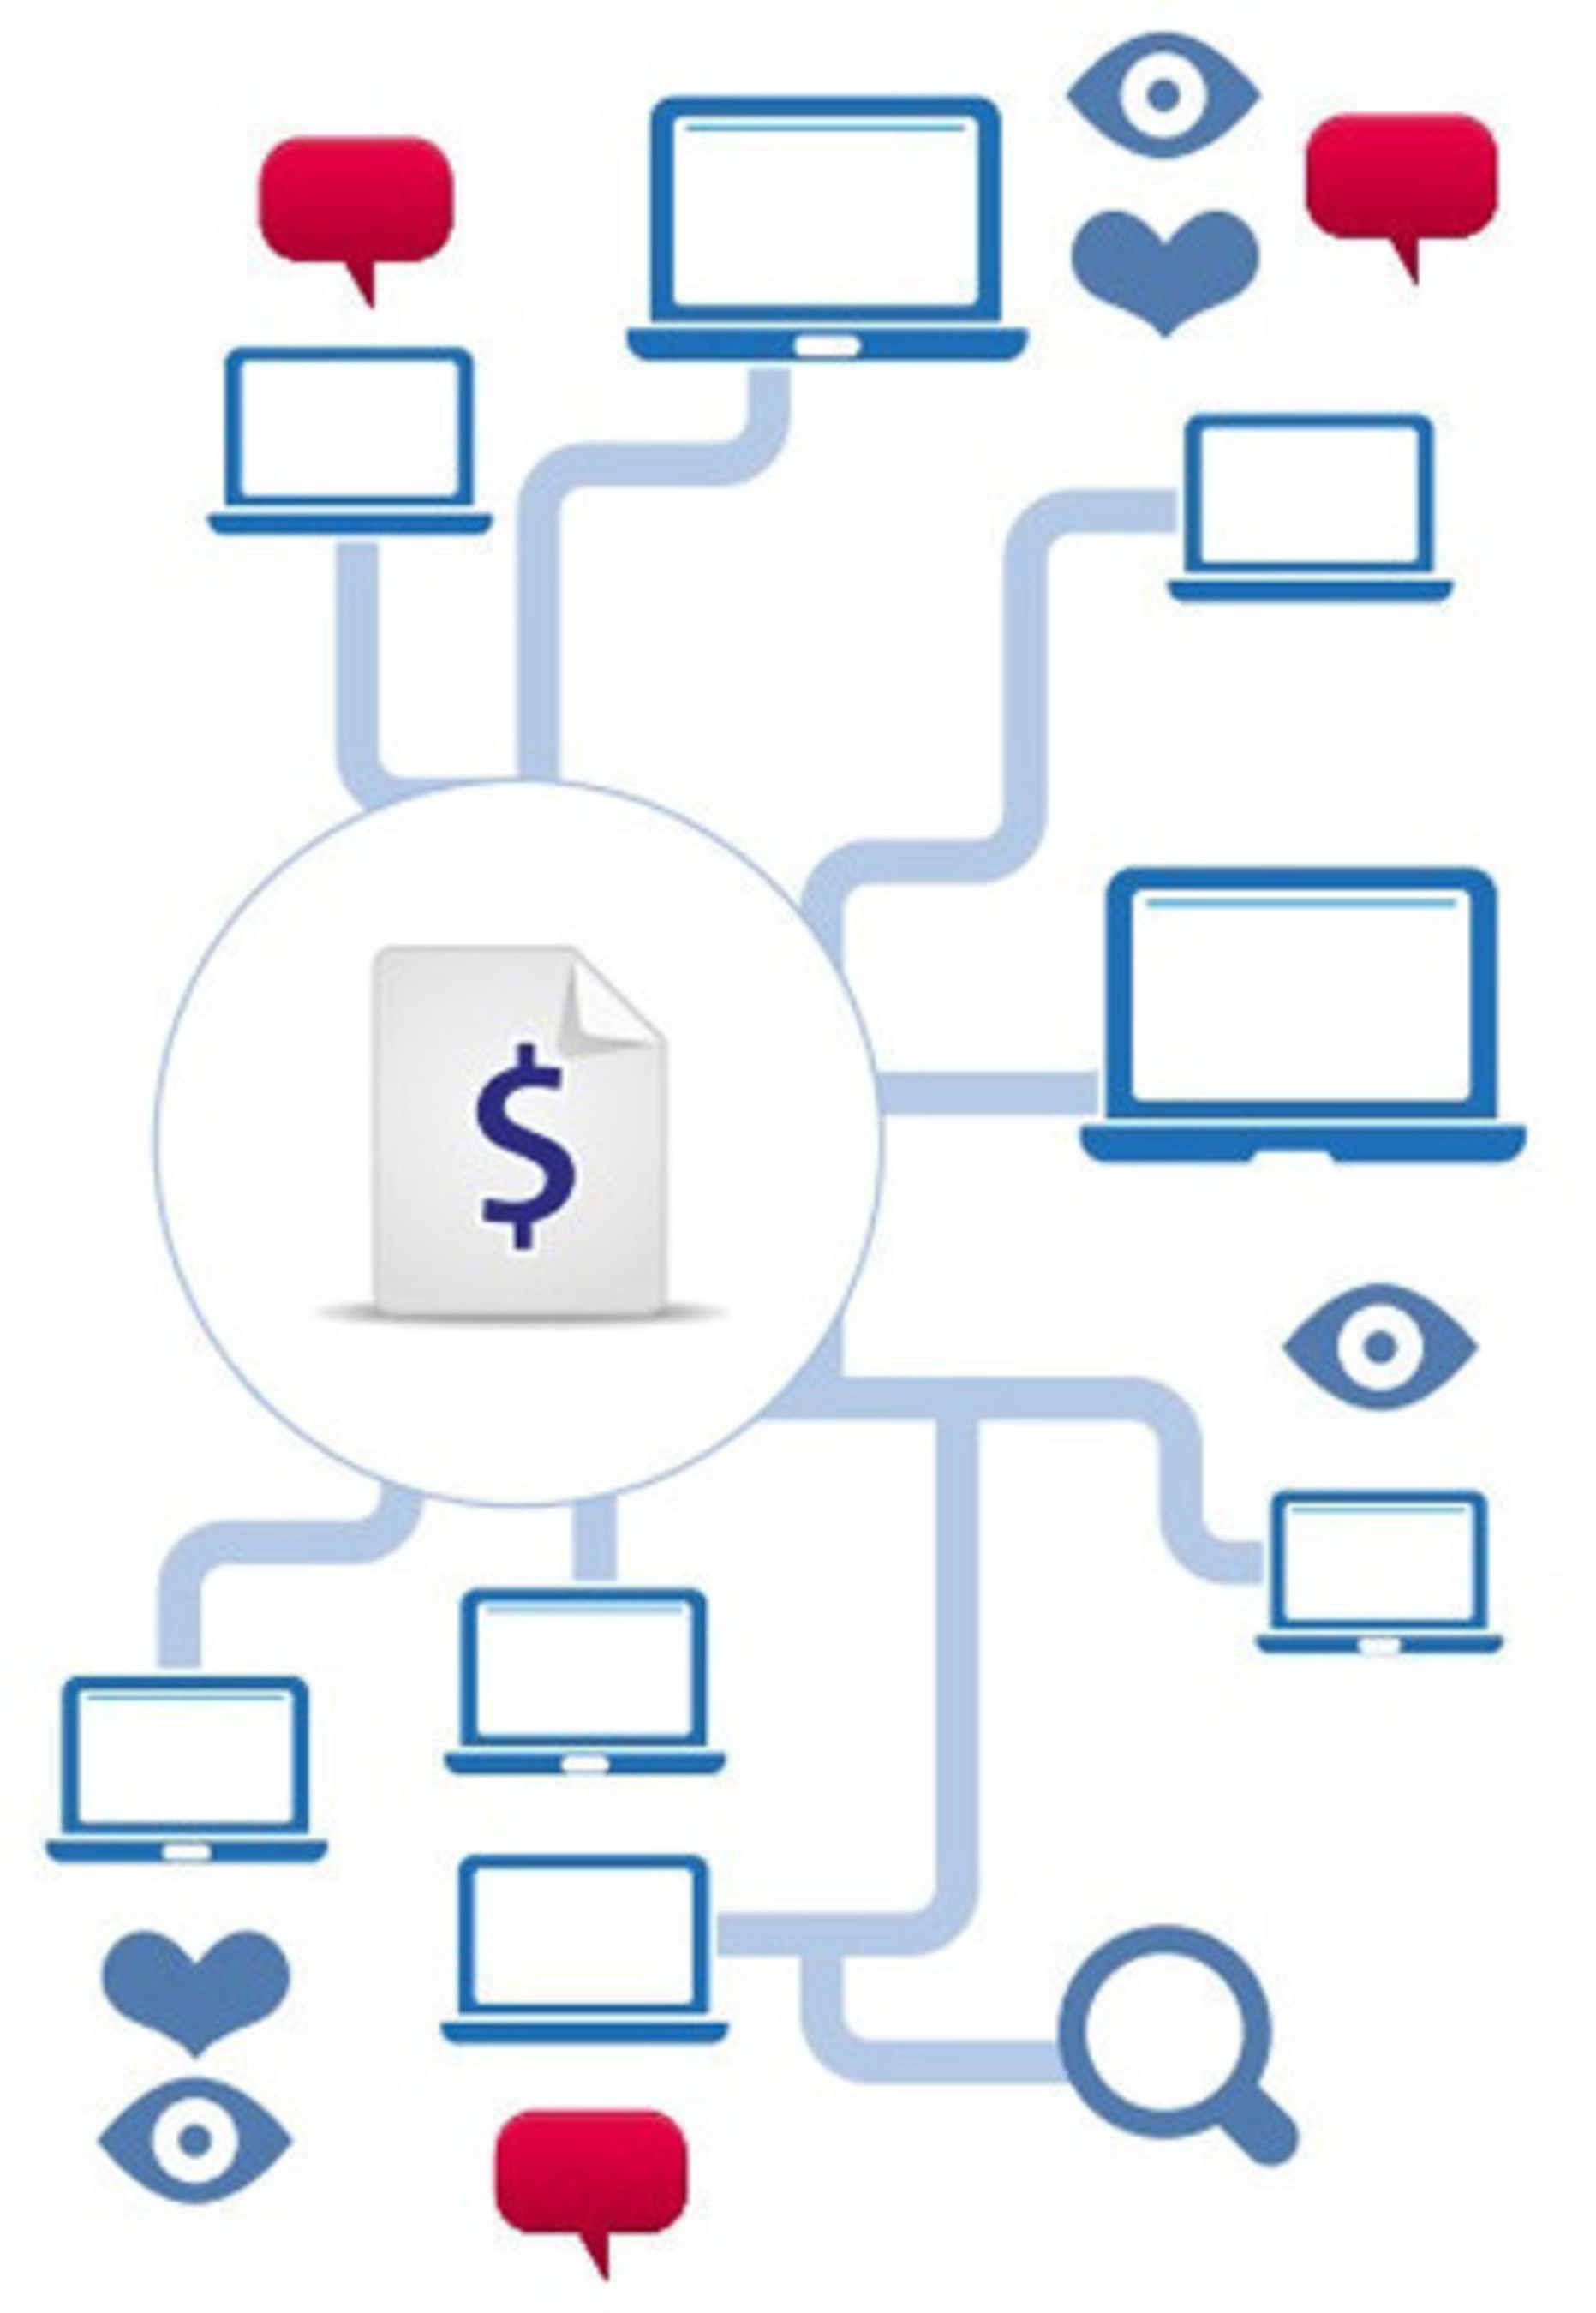 MarketResearch.com Boosts Visibility & Revenue: A Content Distribution Case Study